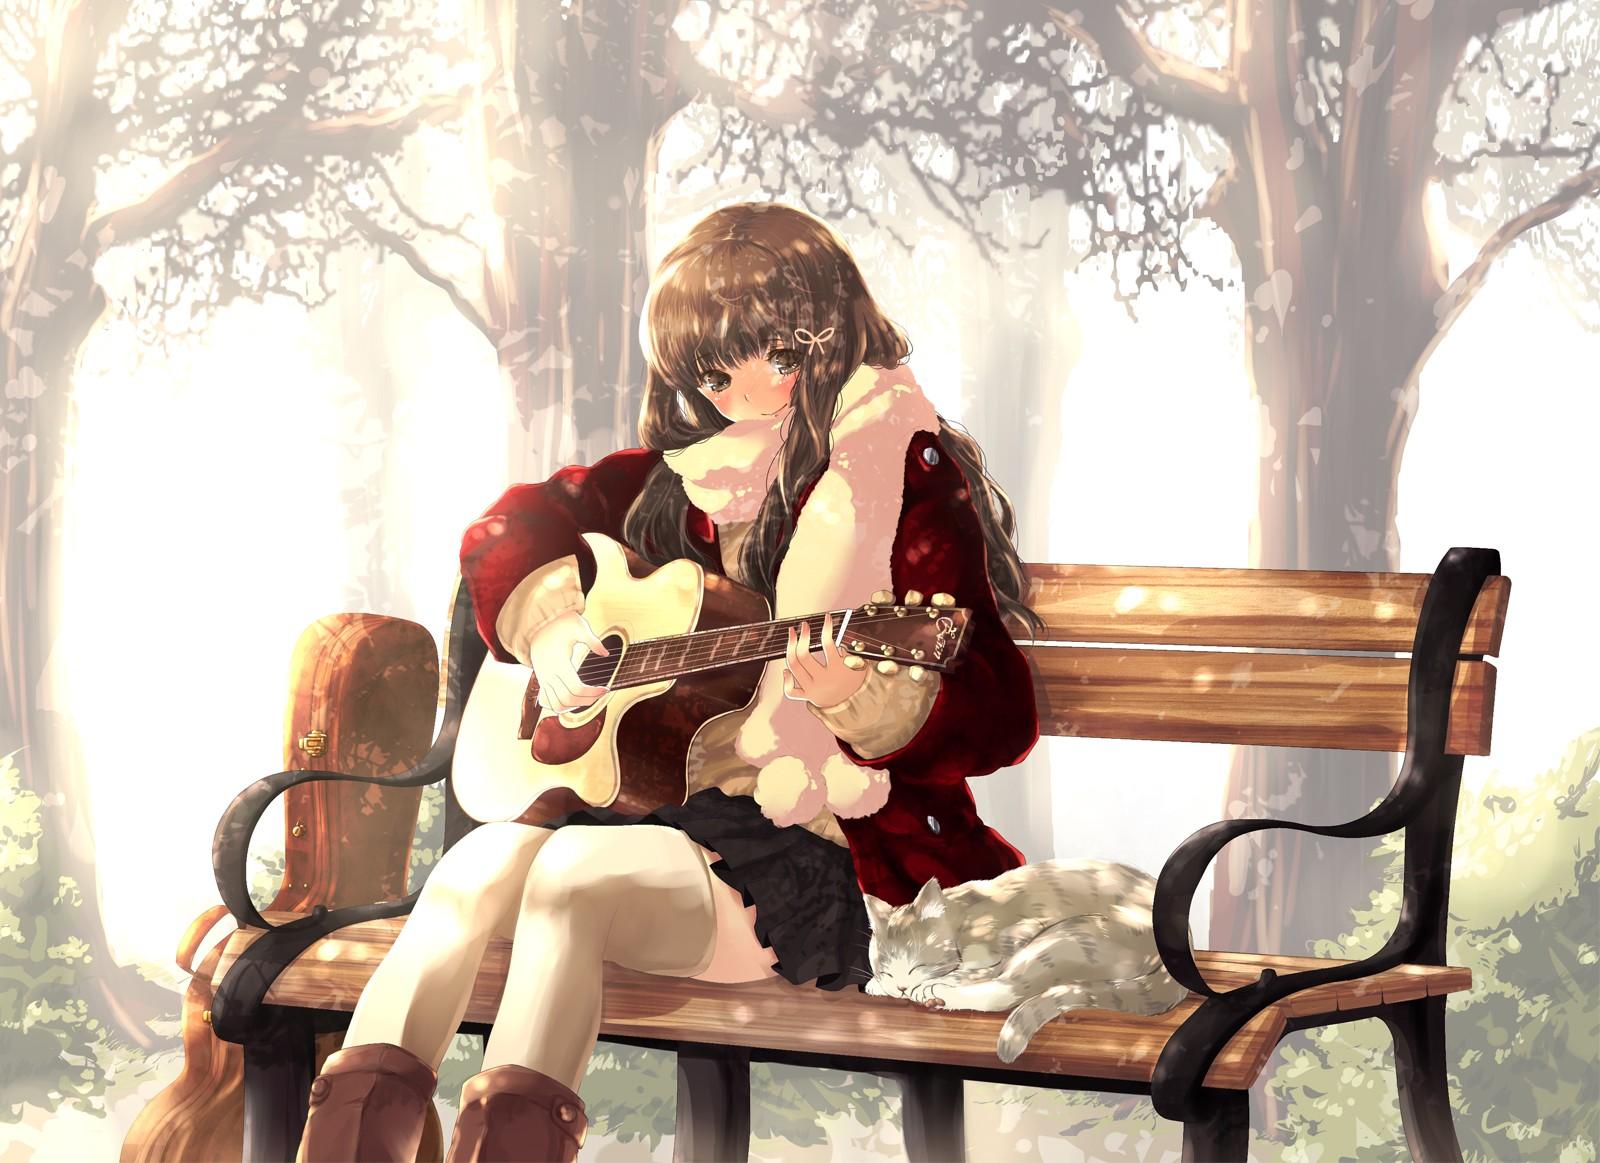 Kho Anime - Manga Anime-guitar-girl-msyugioh123-32779625-1600-1163